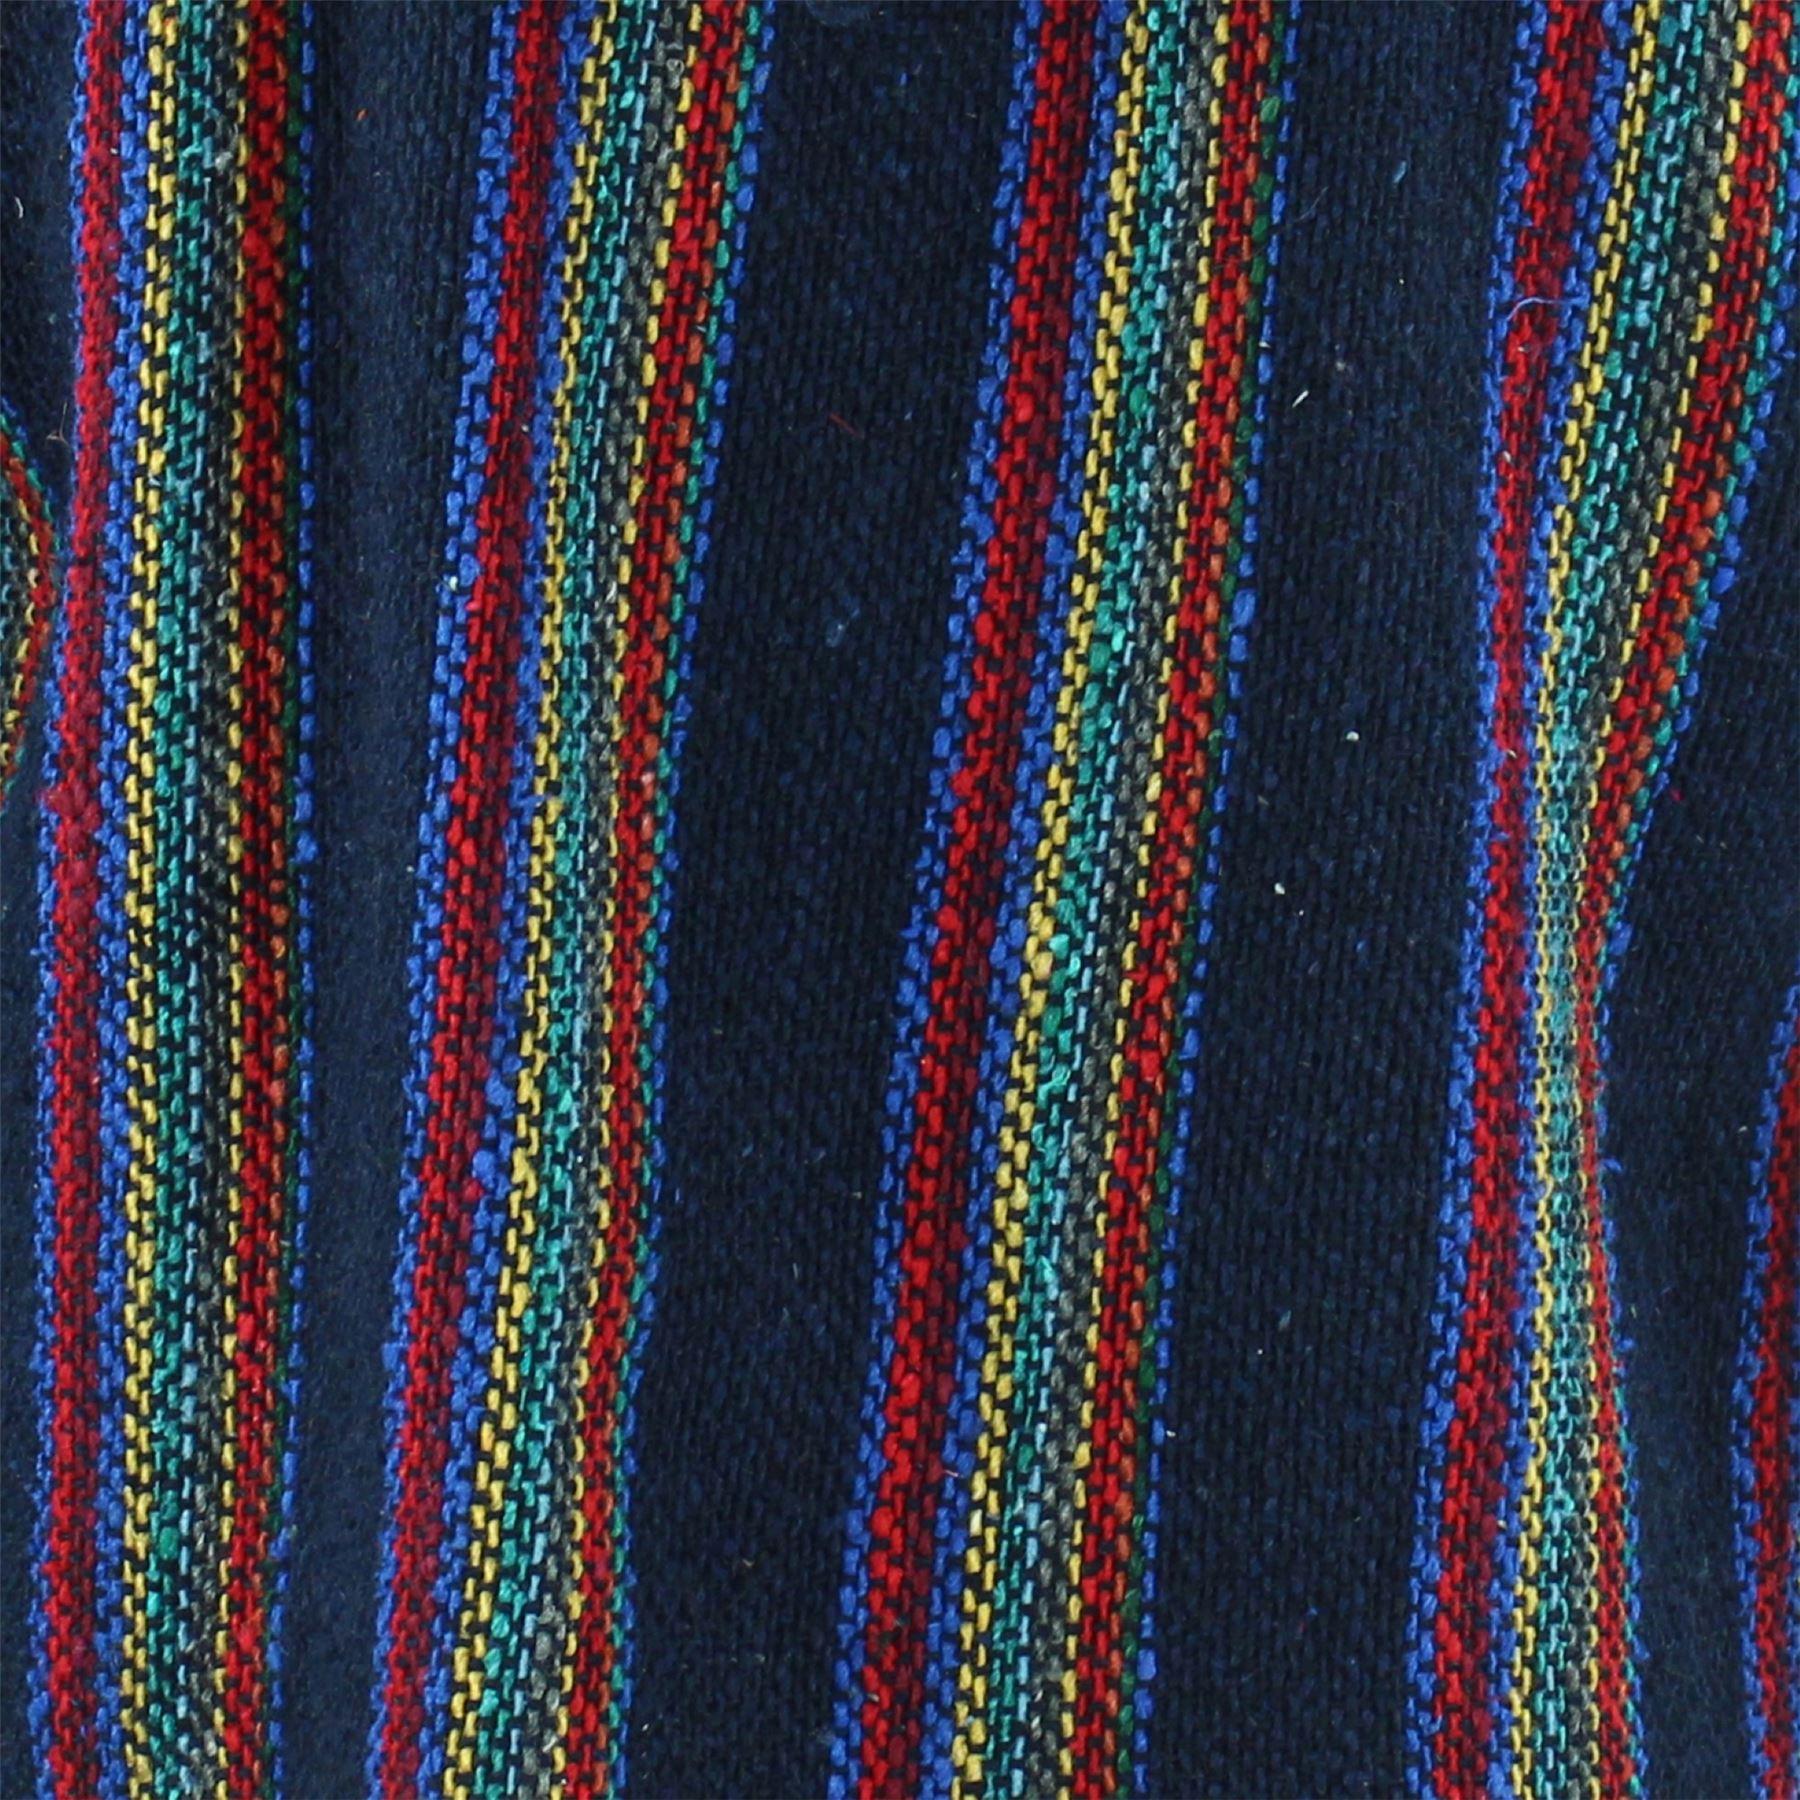 Mexican-Baja-Hoodie-Hoody-Jerga-Rug-Jumper-Siesta-Surf-Hippy-Baha-Pullover thumbnail 84